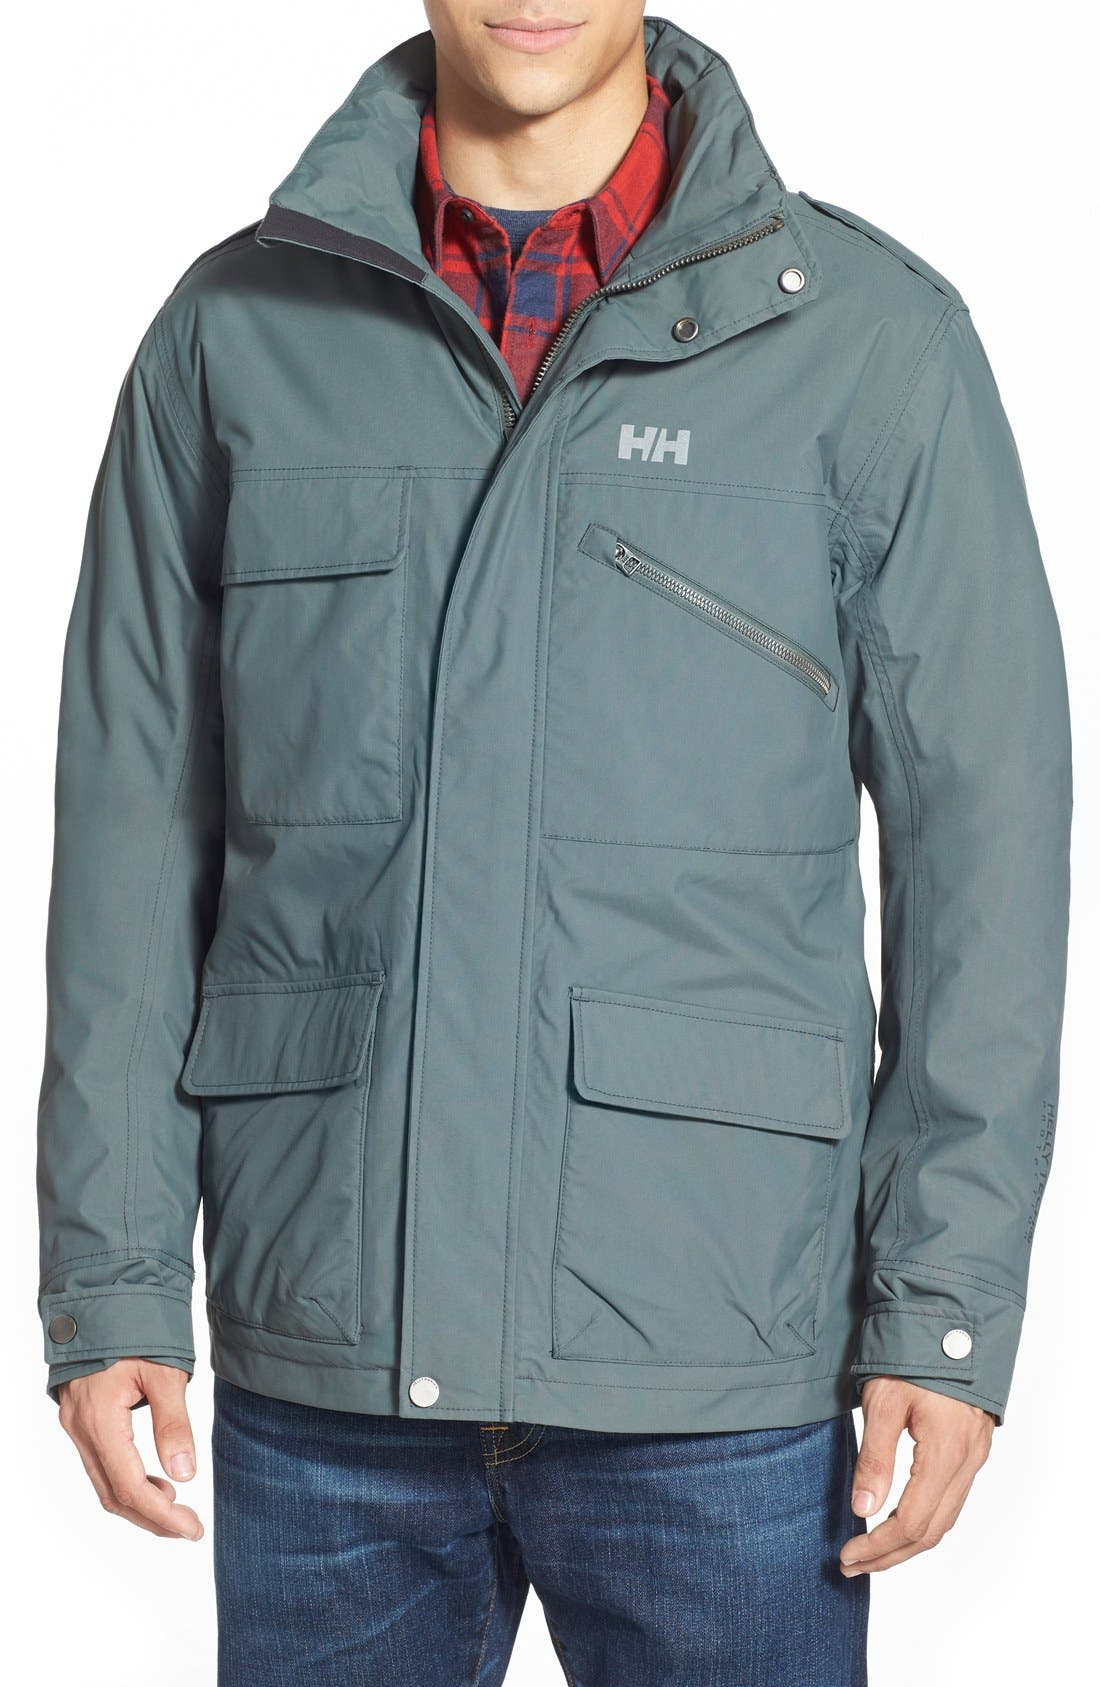 HellyHansen 'Universal' MotoRain Jacket